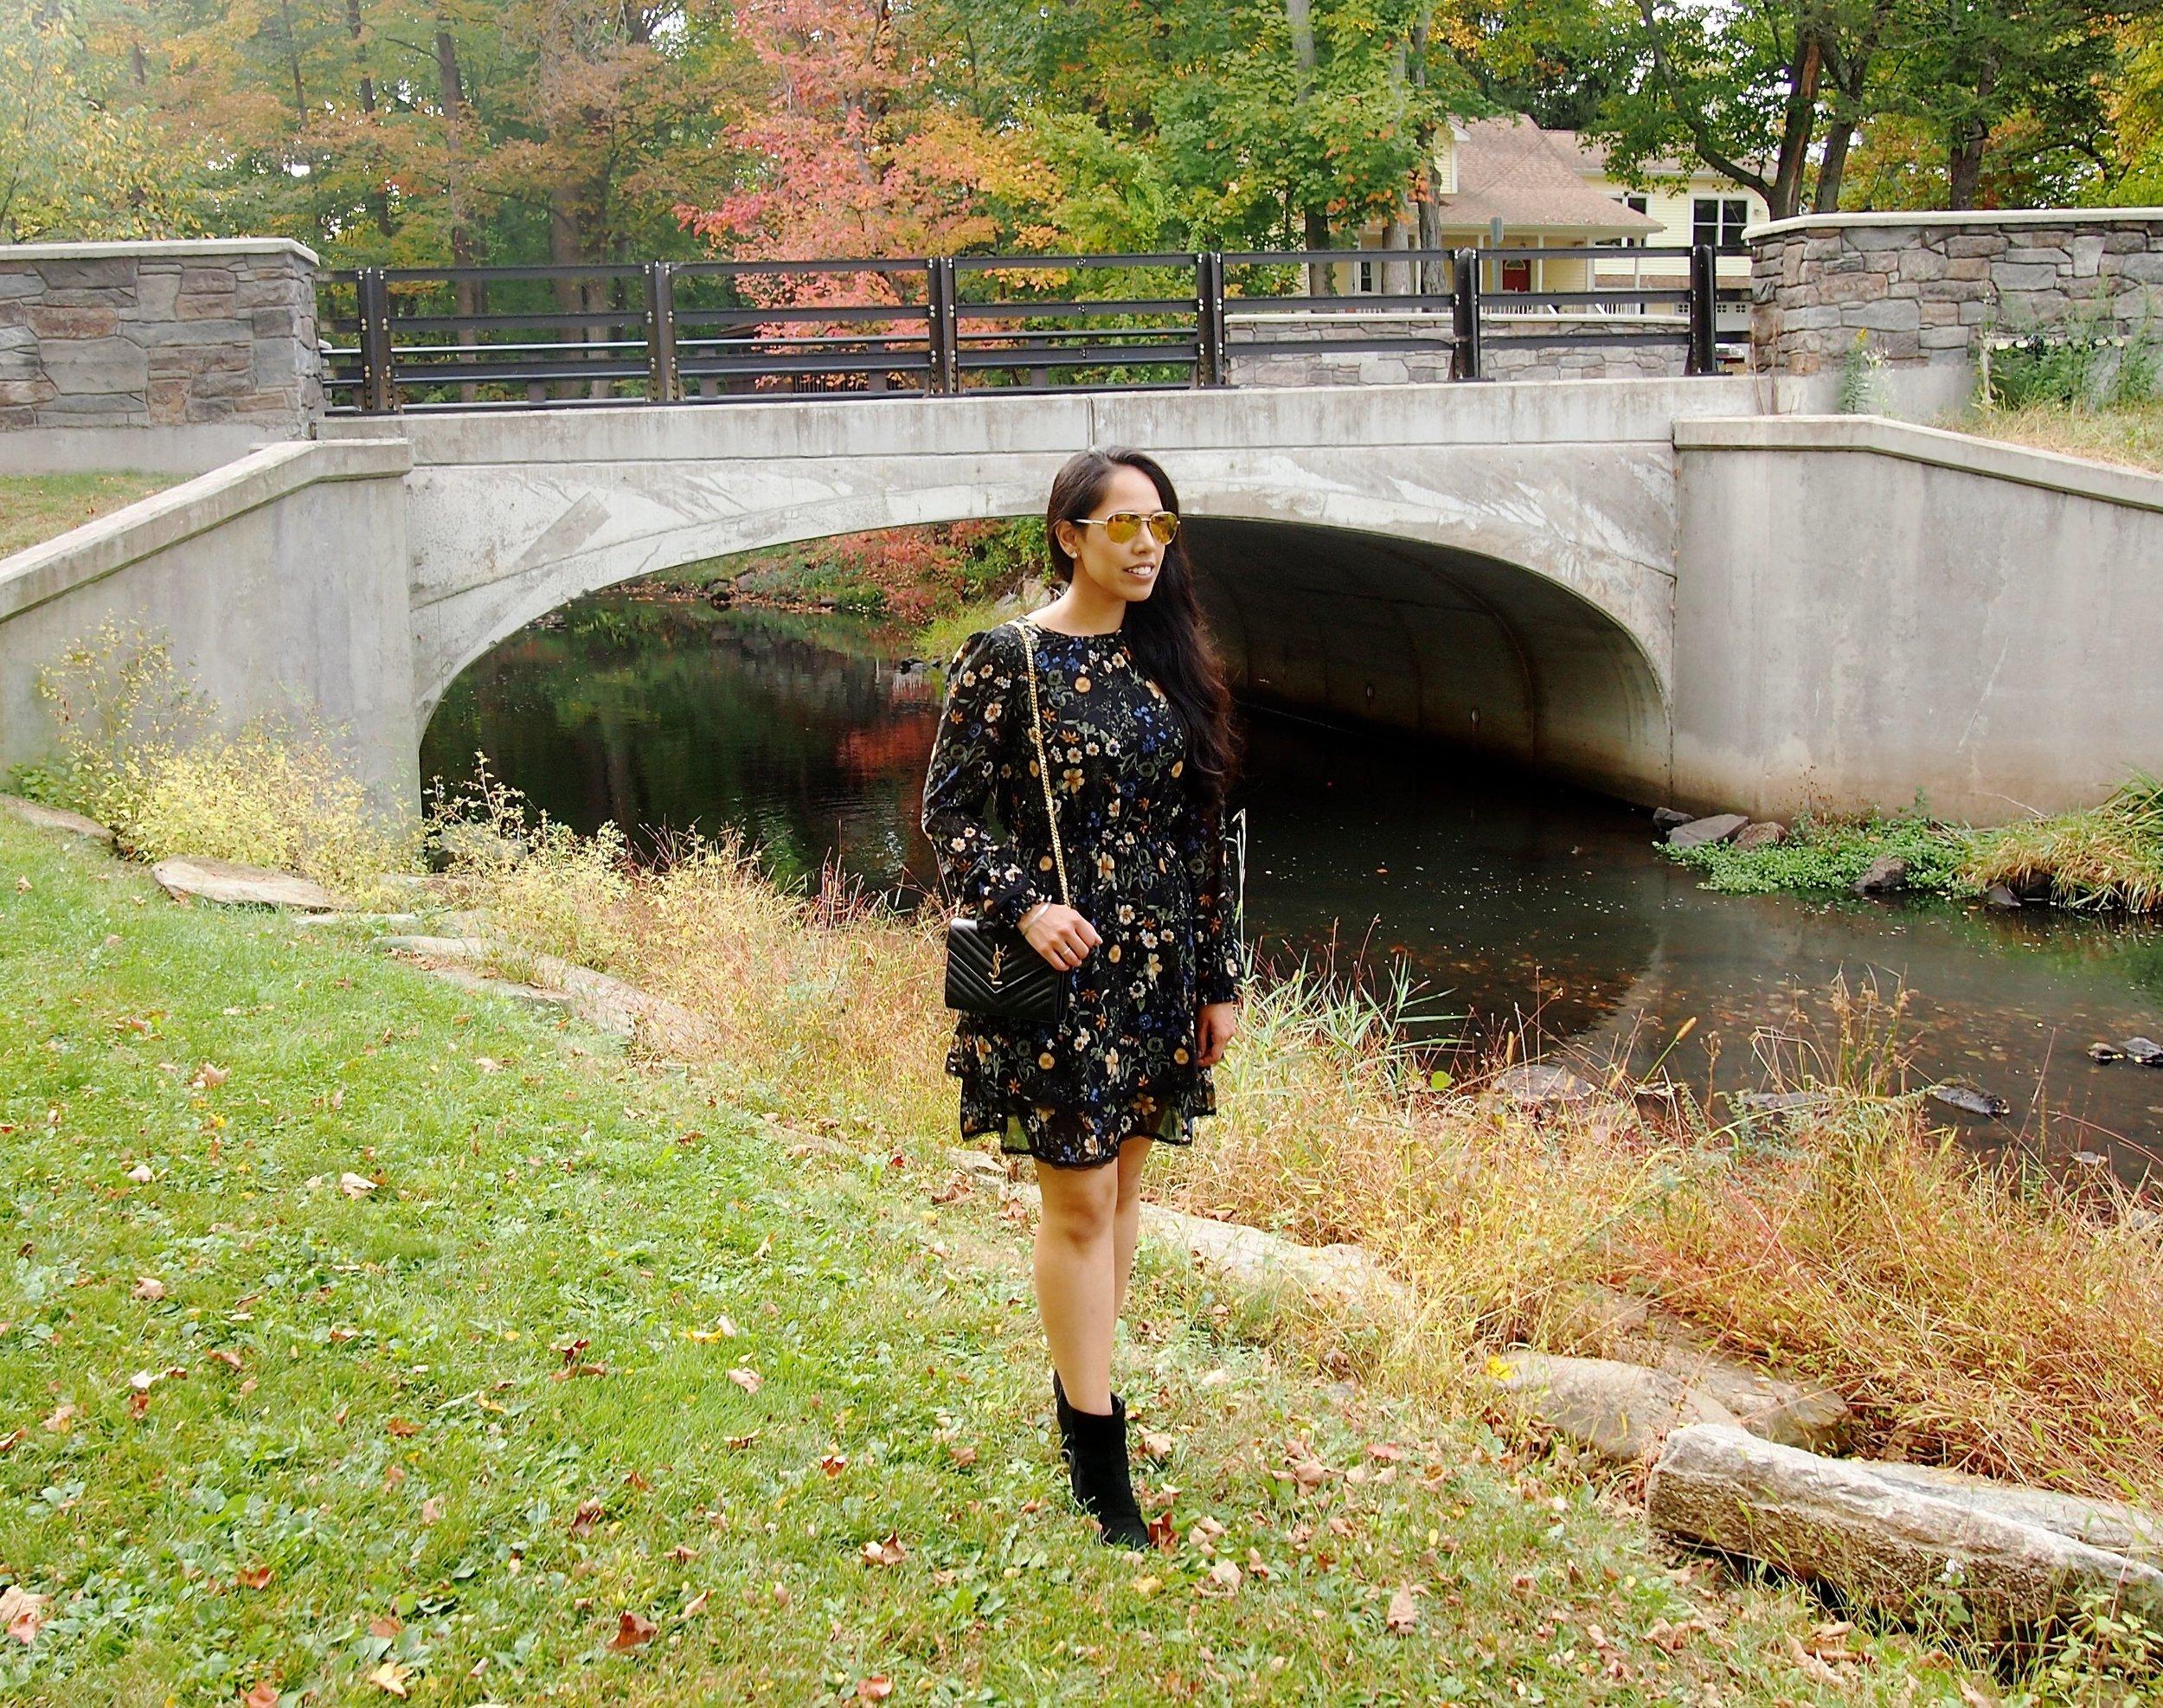 dress-with-booties-fall-fashion-philadelphia.JPG